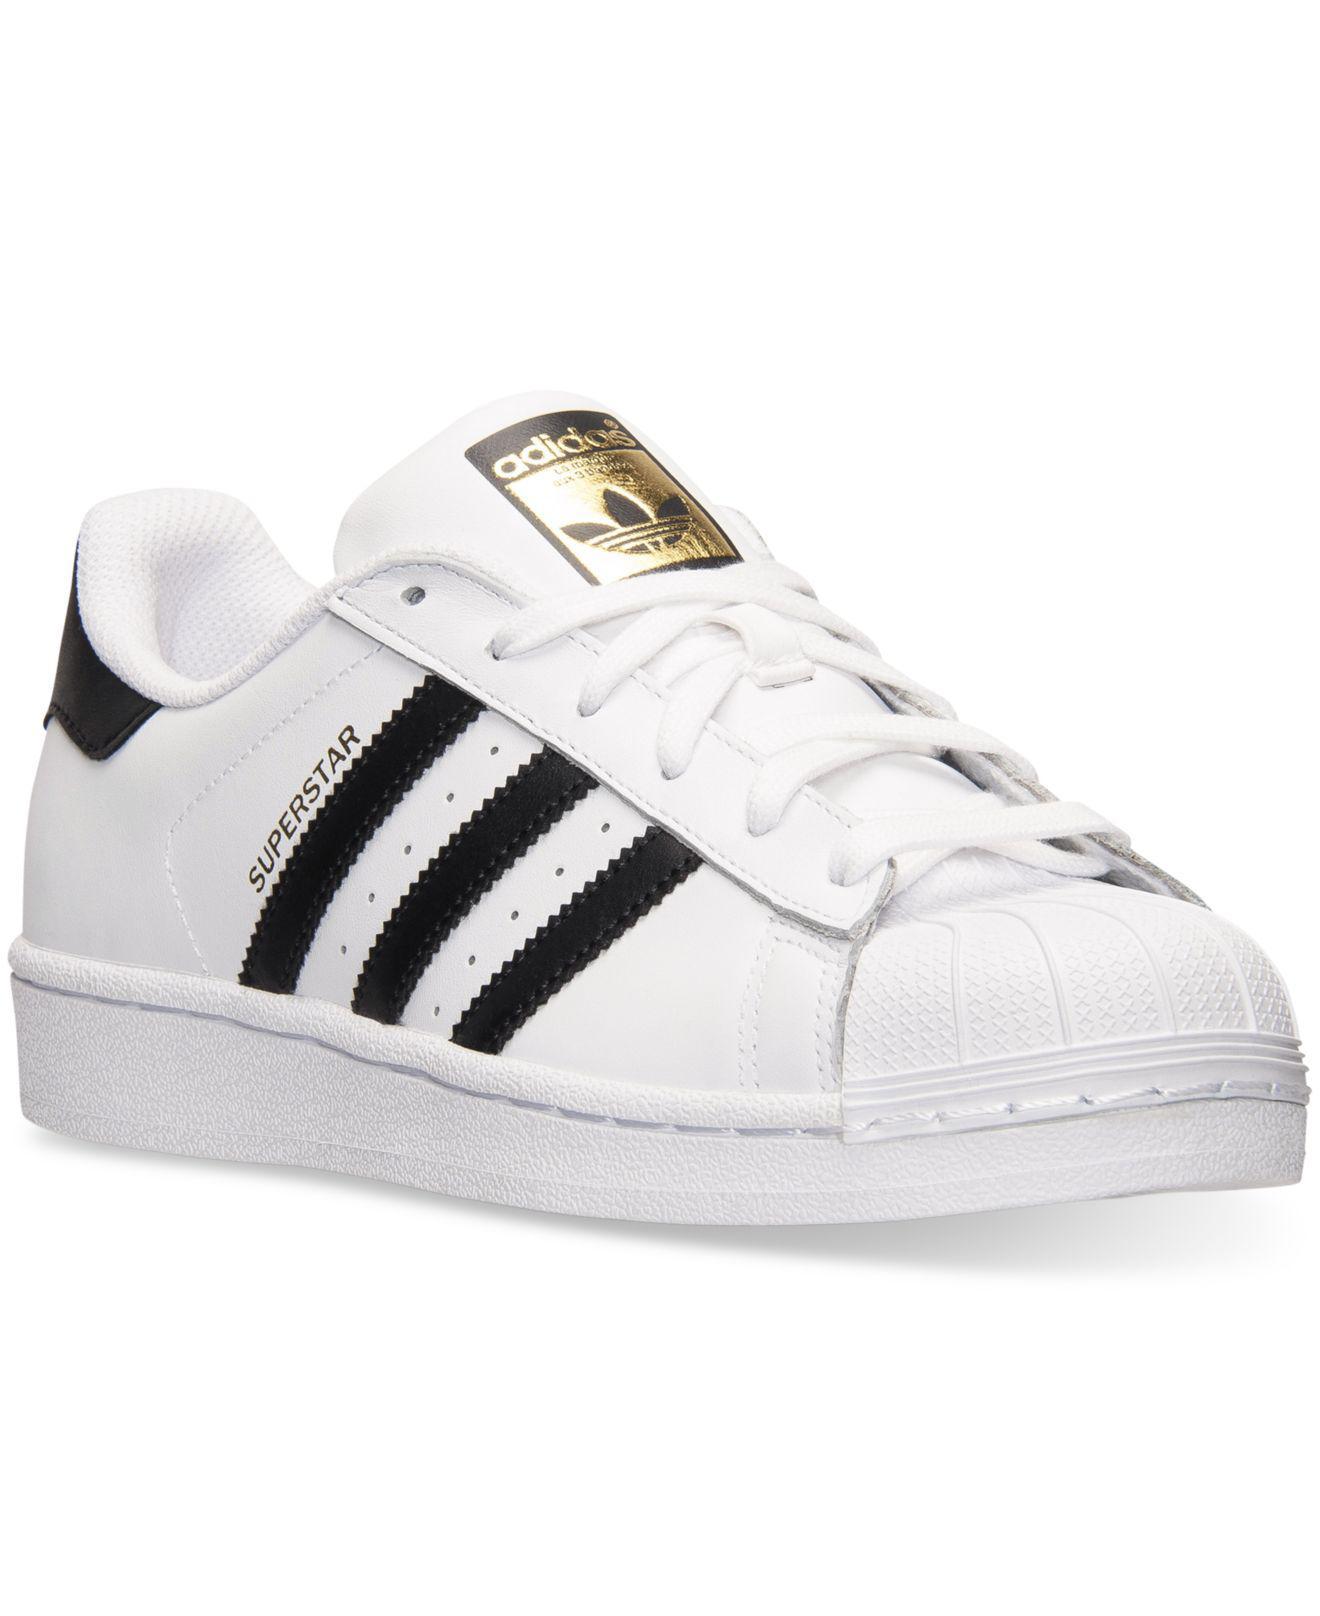 lyst adidas superstar femminile casual scarpe dal traguardo in